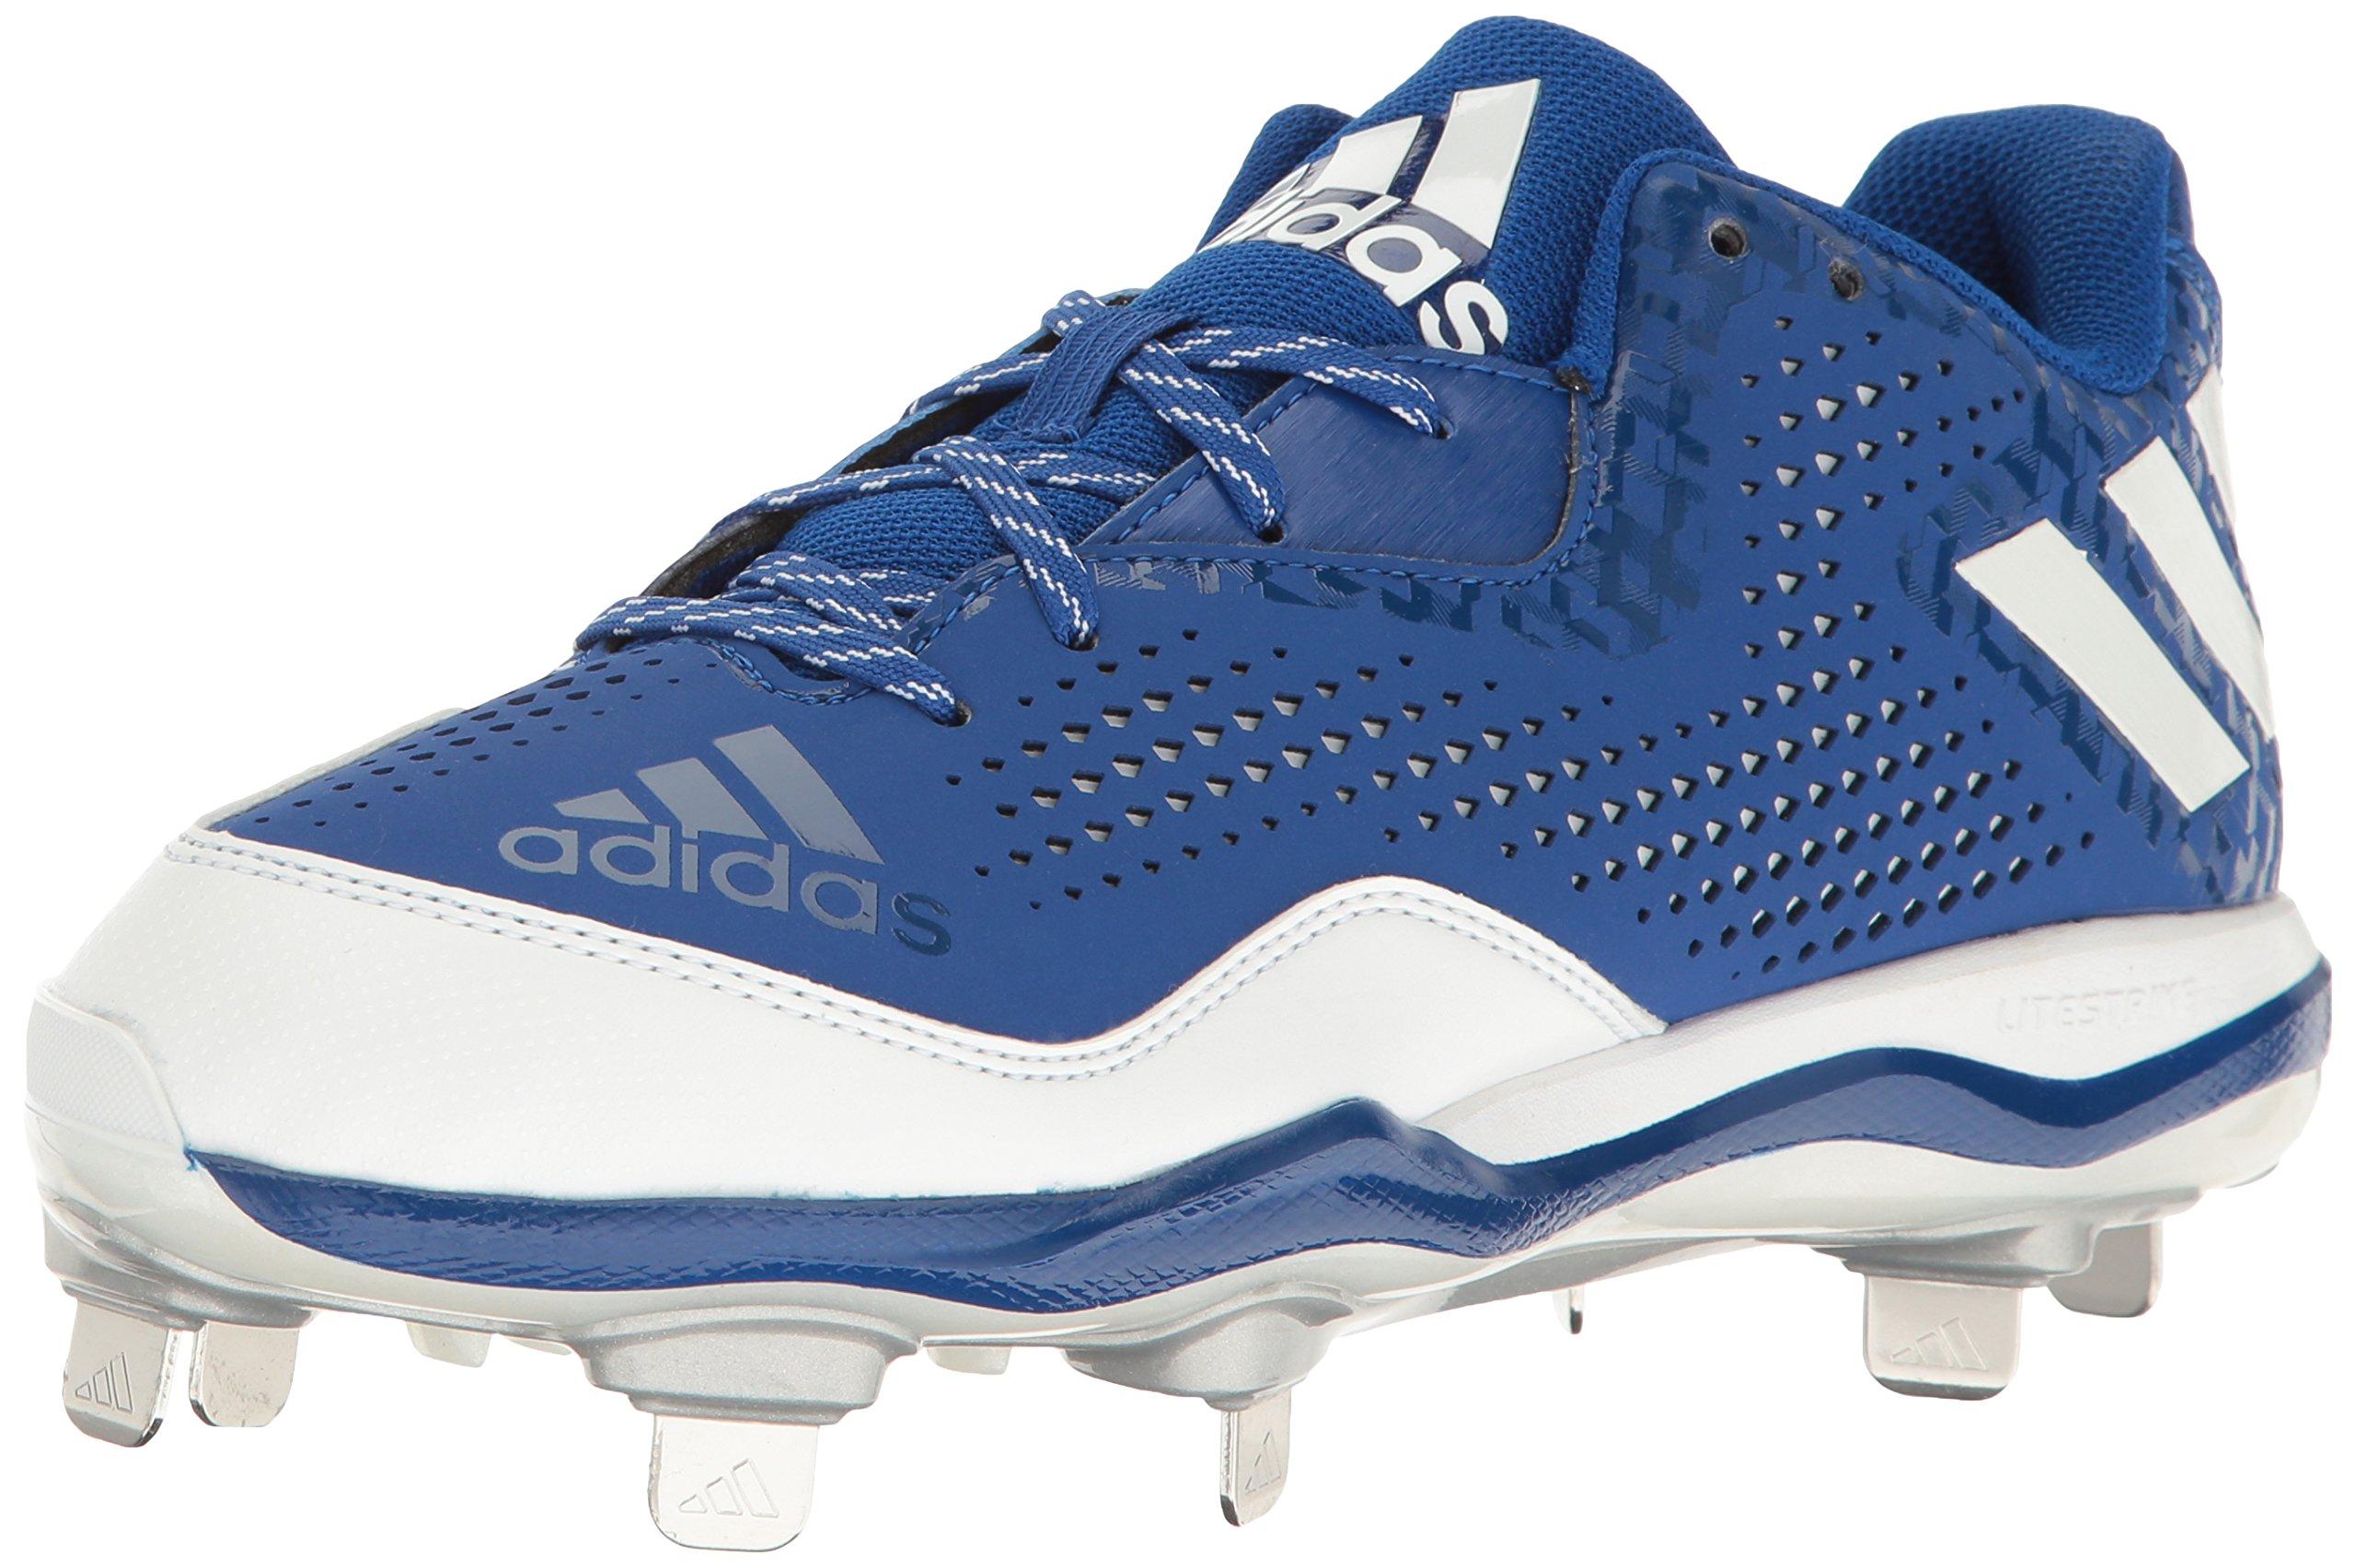 5fd1dcfb0dd86 Galleon - Adidas Men's Freak X Carbon Mid Baseball Shoe, Collegiate ...